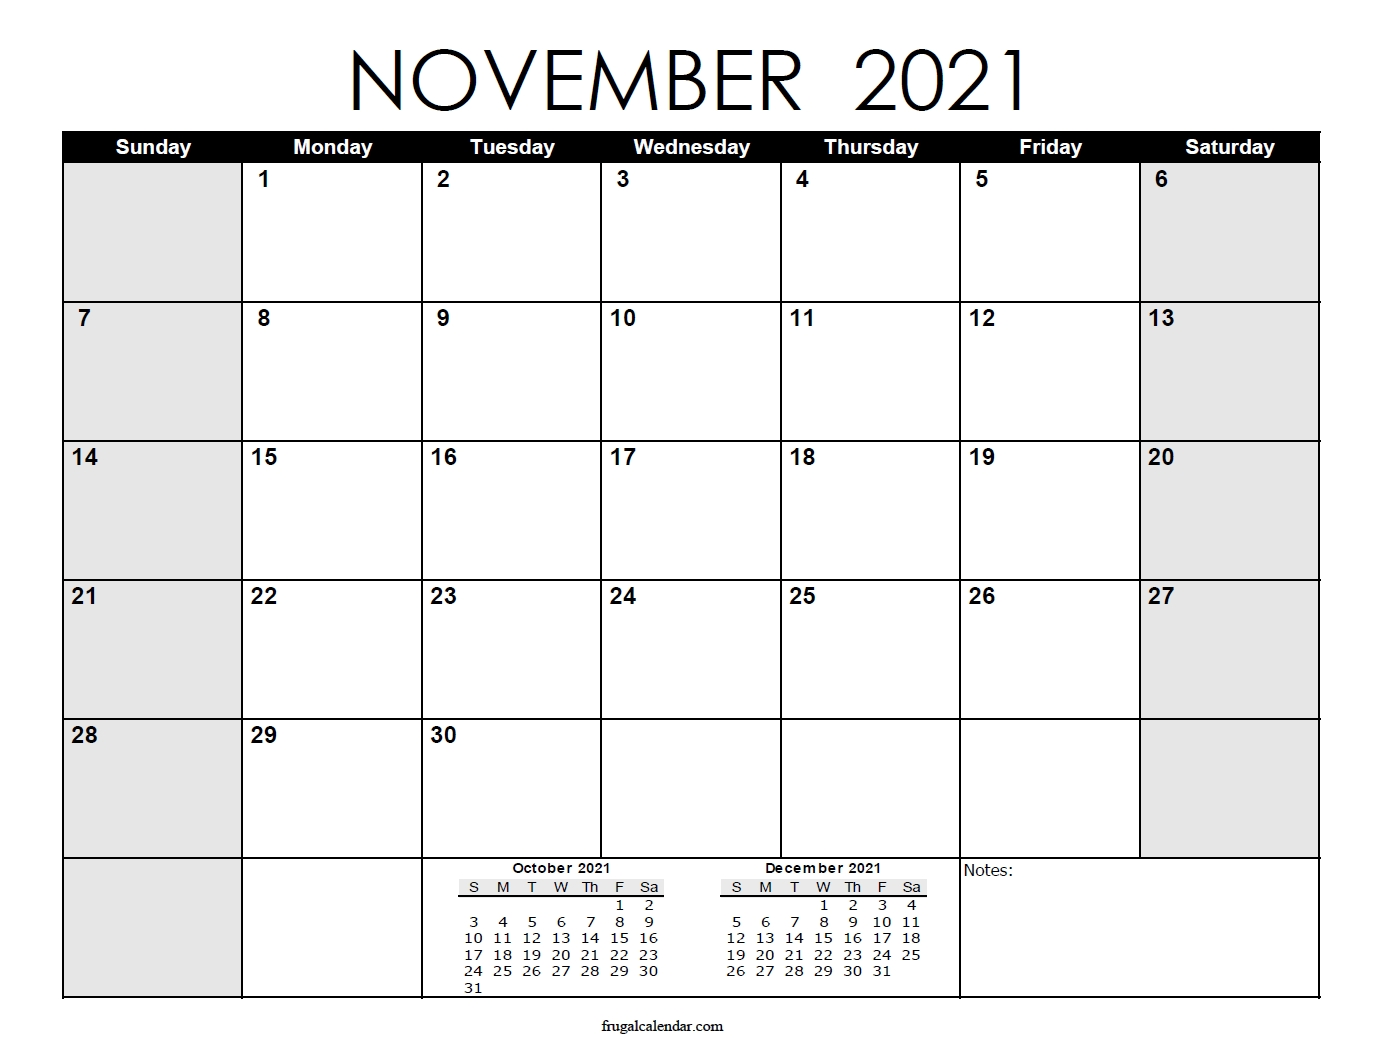 November | 2021 Calendars Printable Calendar For November 2021 With Holidays